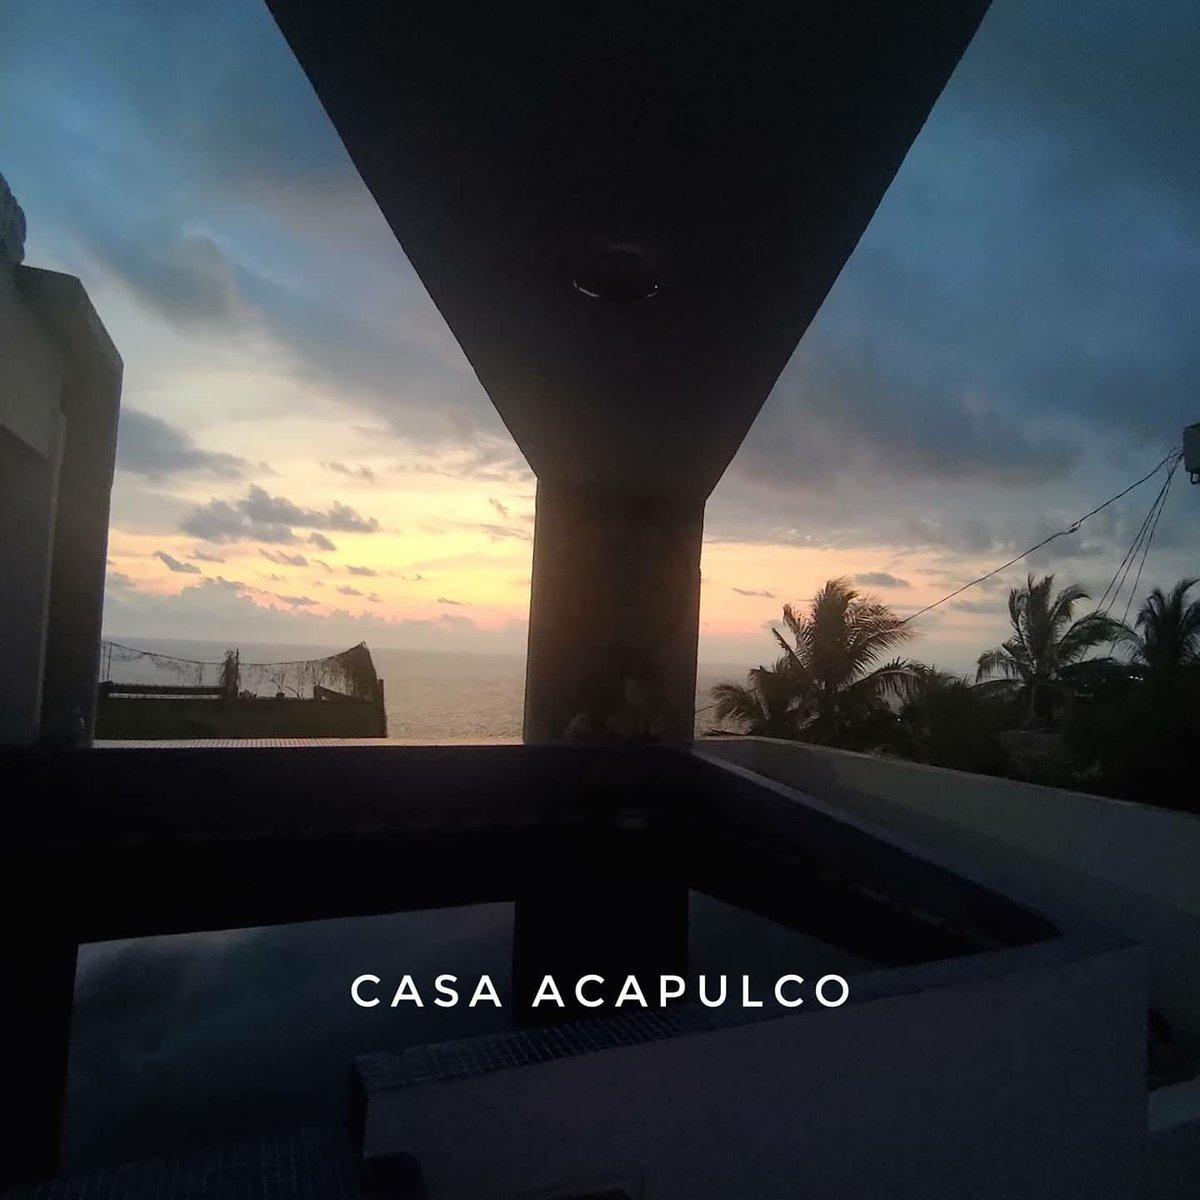 Casa Acapulco . 🌎🌅🏖️🏄 We Love Architecture .  #design #archidesign #architecture #archdaily #iarchitect #idesign #enginering #archidaily #mexico #mood #interiordesign #engineer #architecturephotography #minimal #mexico #acapulco  #acapulcoart #acapulcoshore https://t.co/9kXvKNNxgz